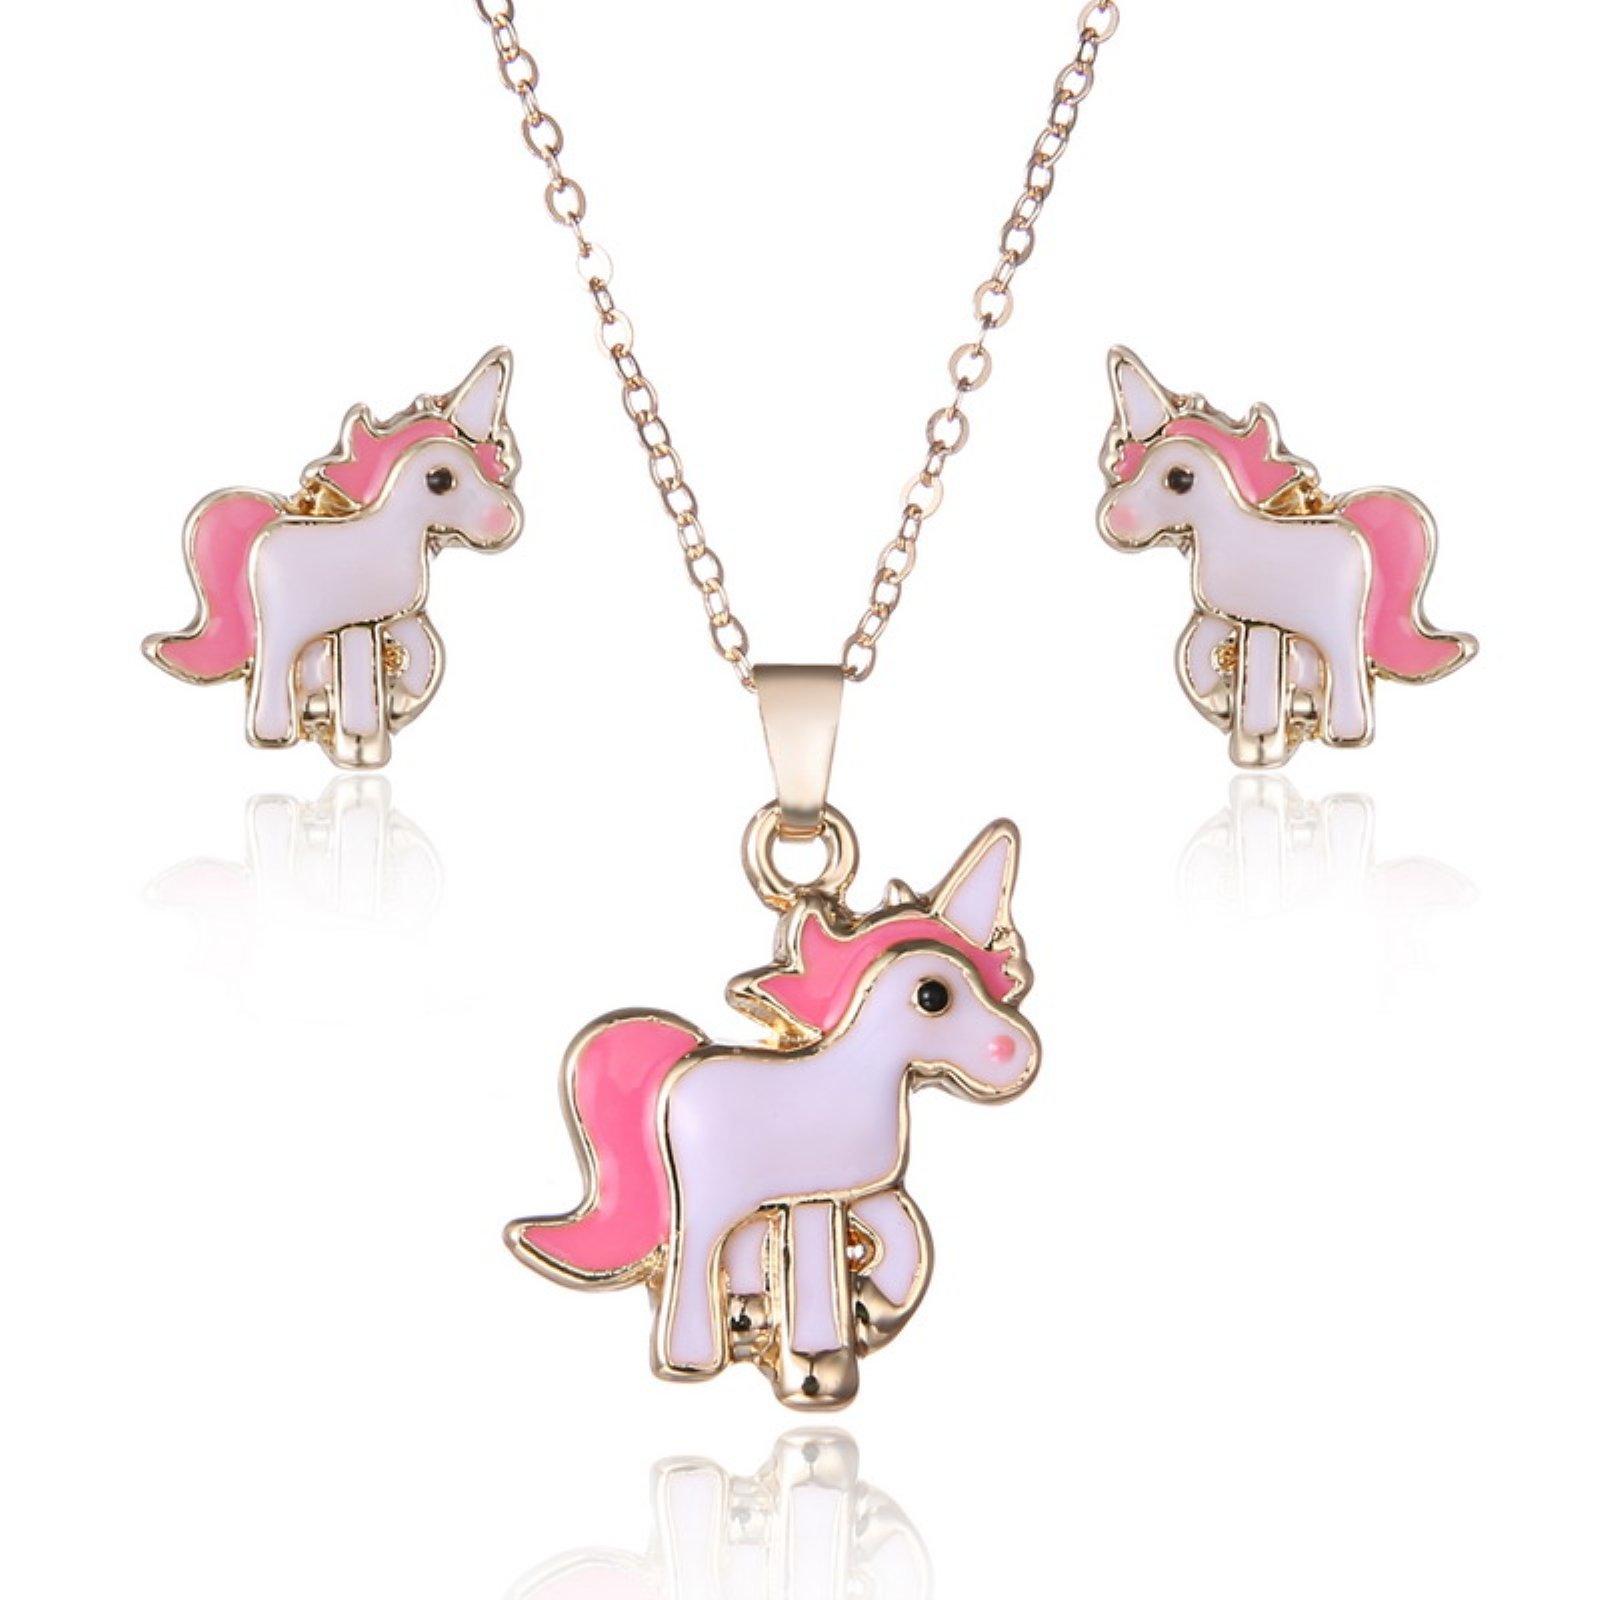 ptk12 Hot Sale Alloy Animal Jewelry Set Chain Kids Jewelry Cartoon Horse Necklace Earring Set